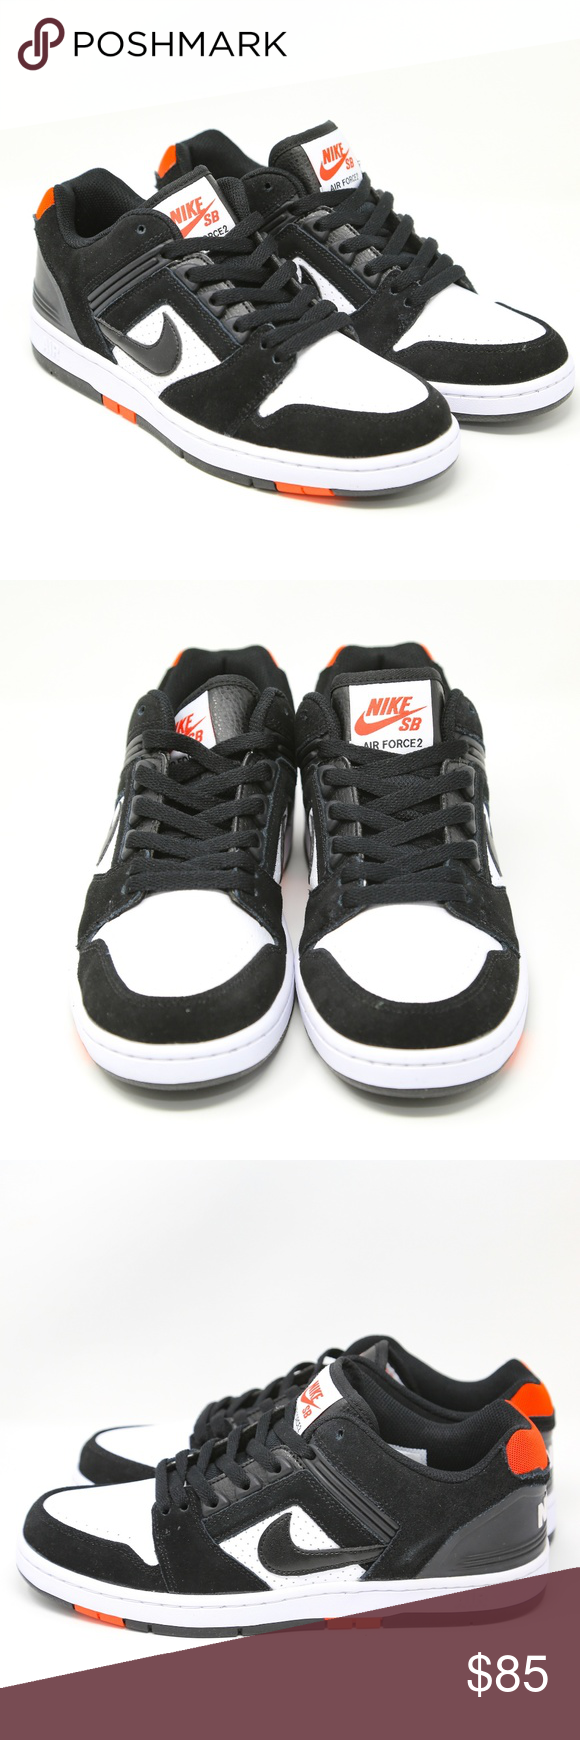 24b430025f71b Nike SB Air Force II 2 Low BRED Black Red AO0300 9 Men's Nike SB Air ...